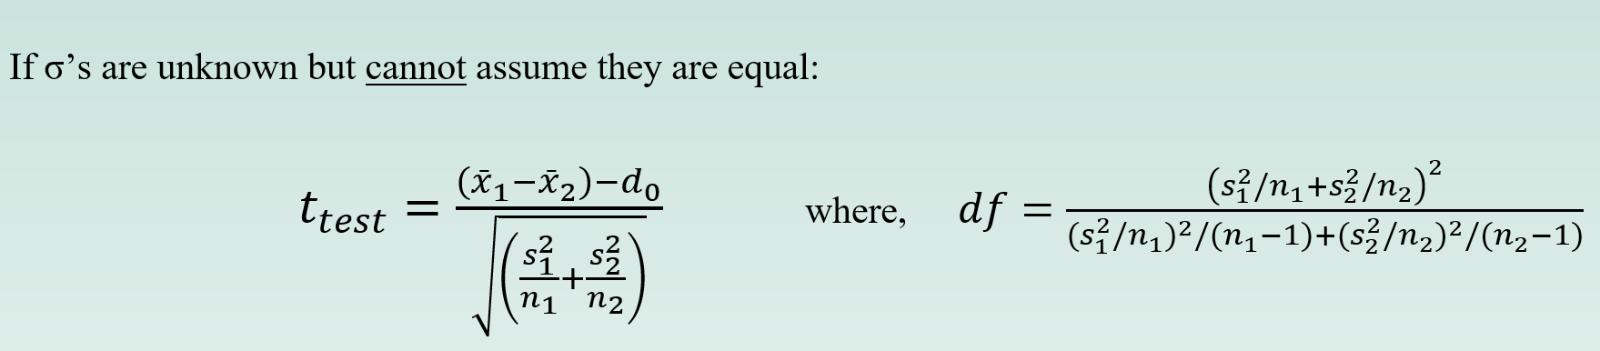 sigmas unknown unequal